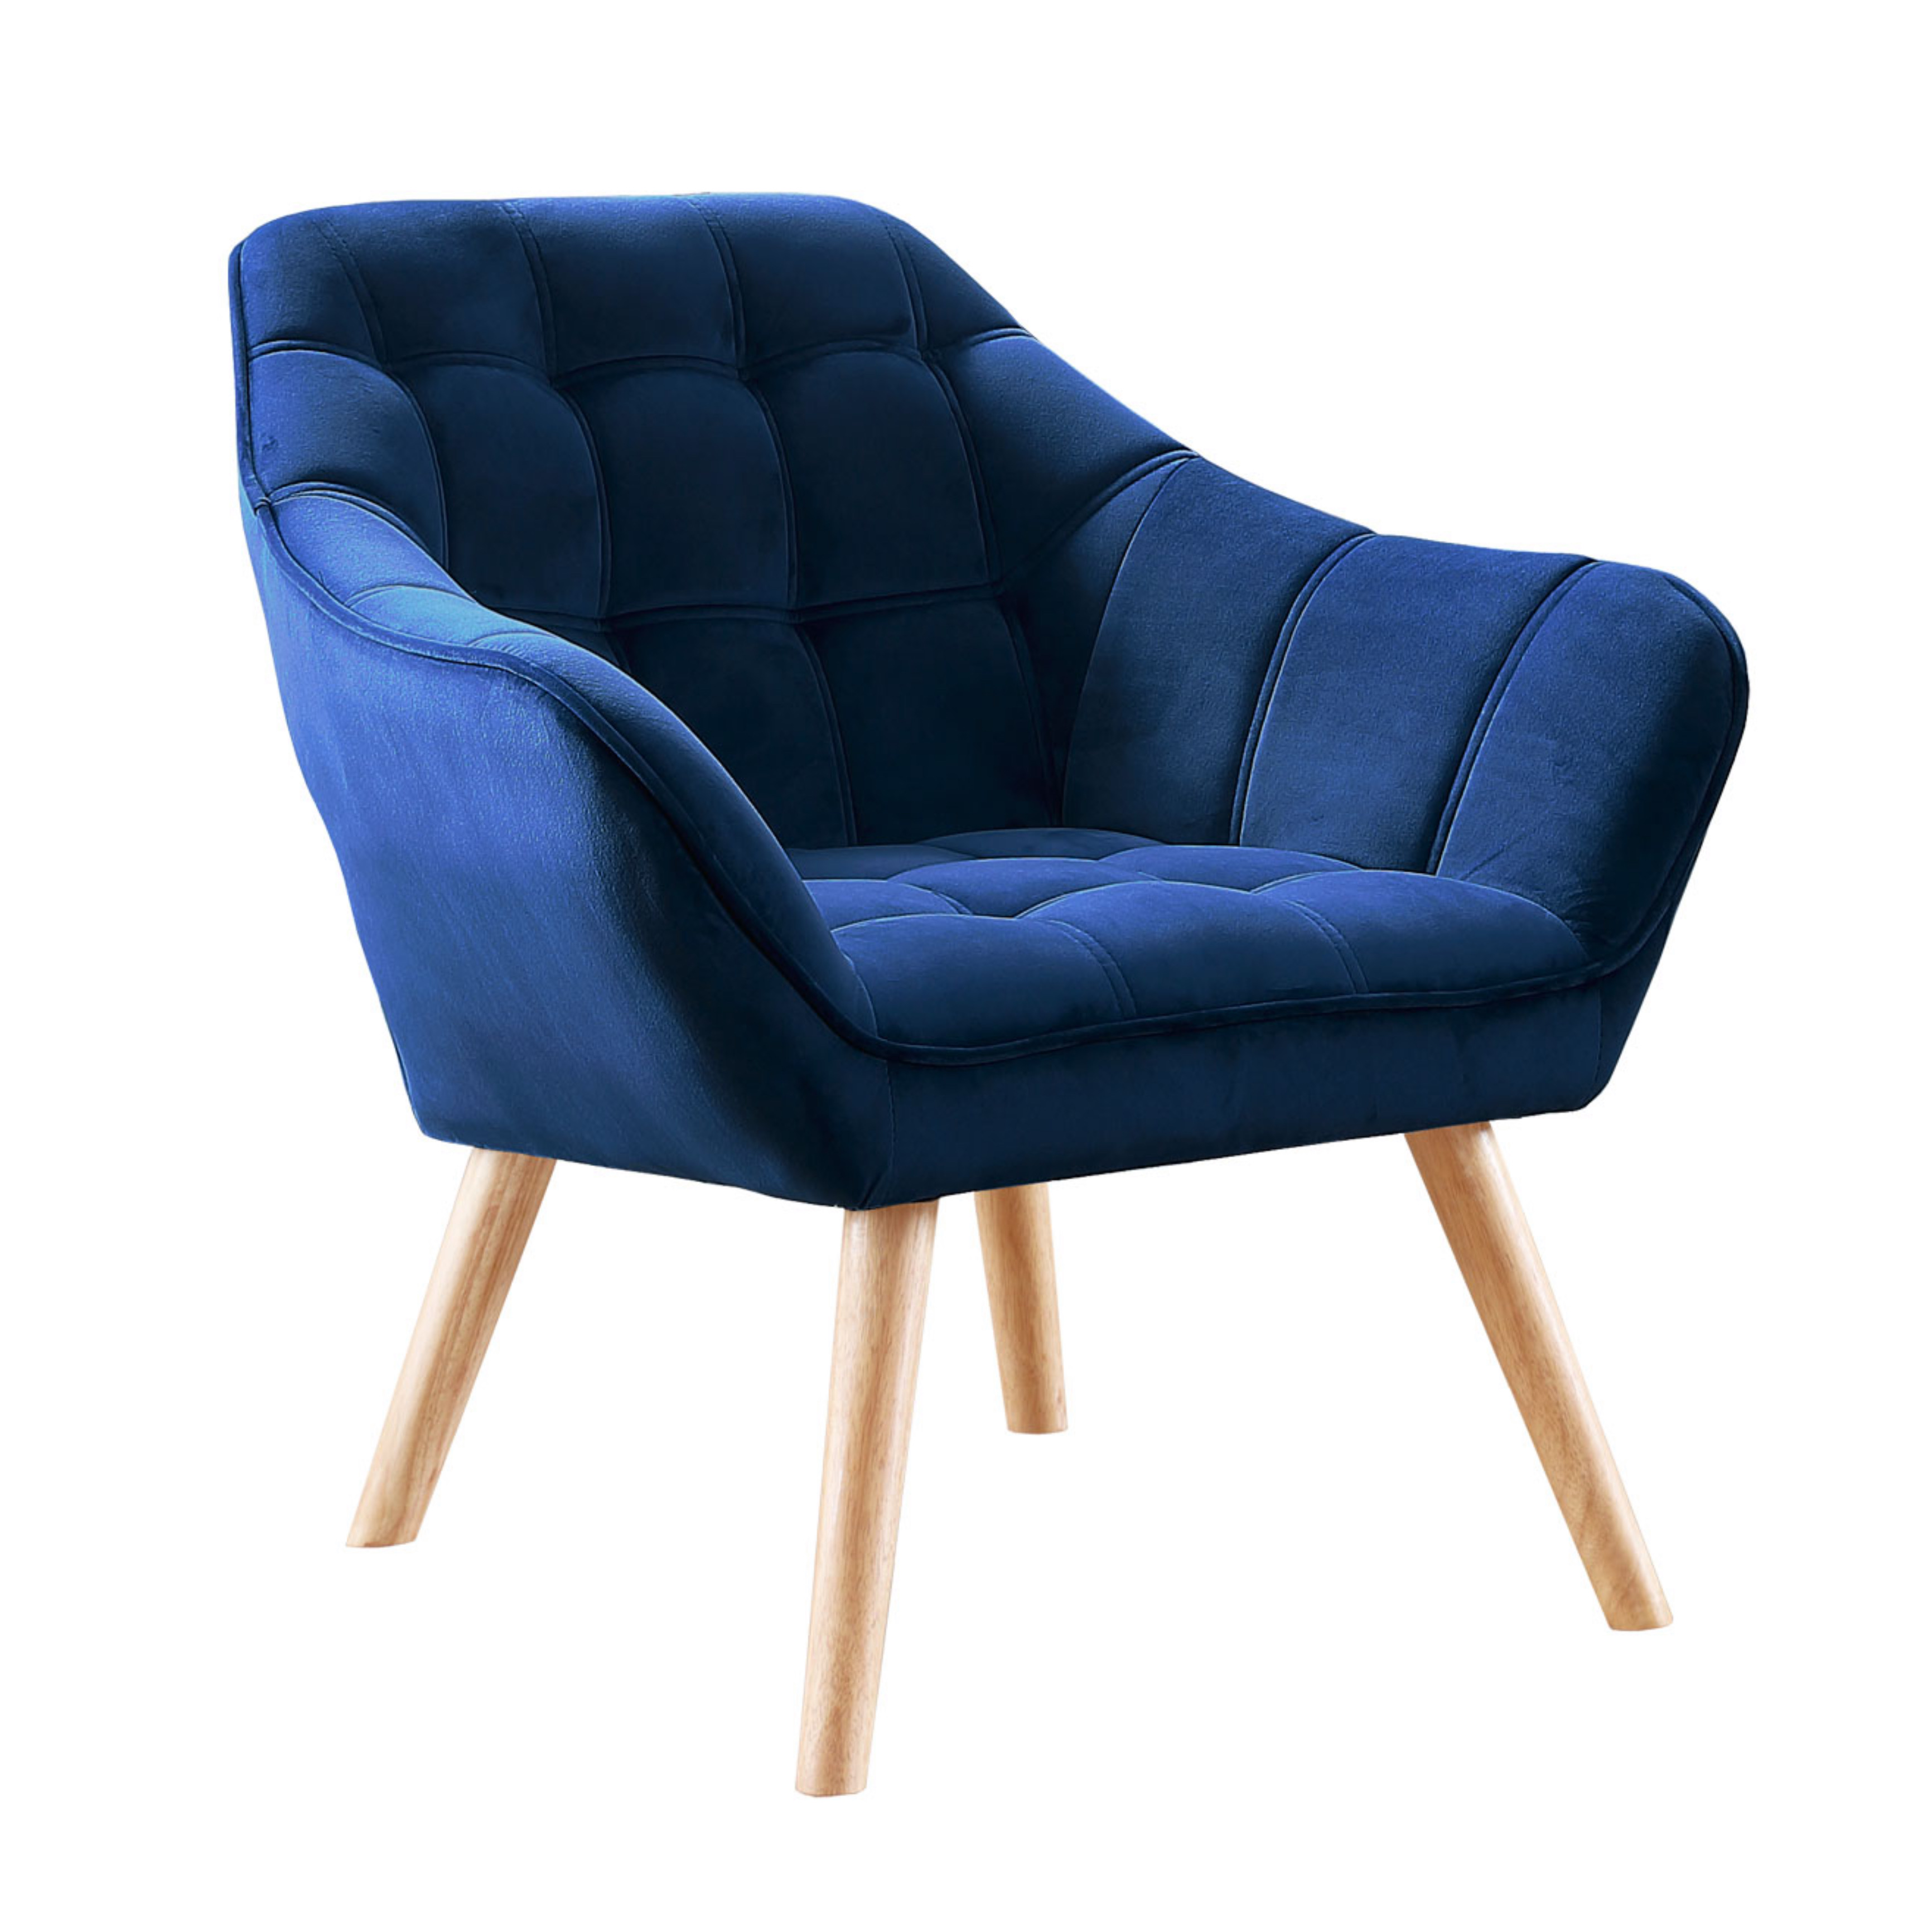 29605-sillon-irvin-tejido-azul-velvet.jpeg